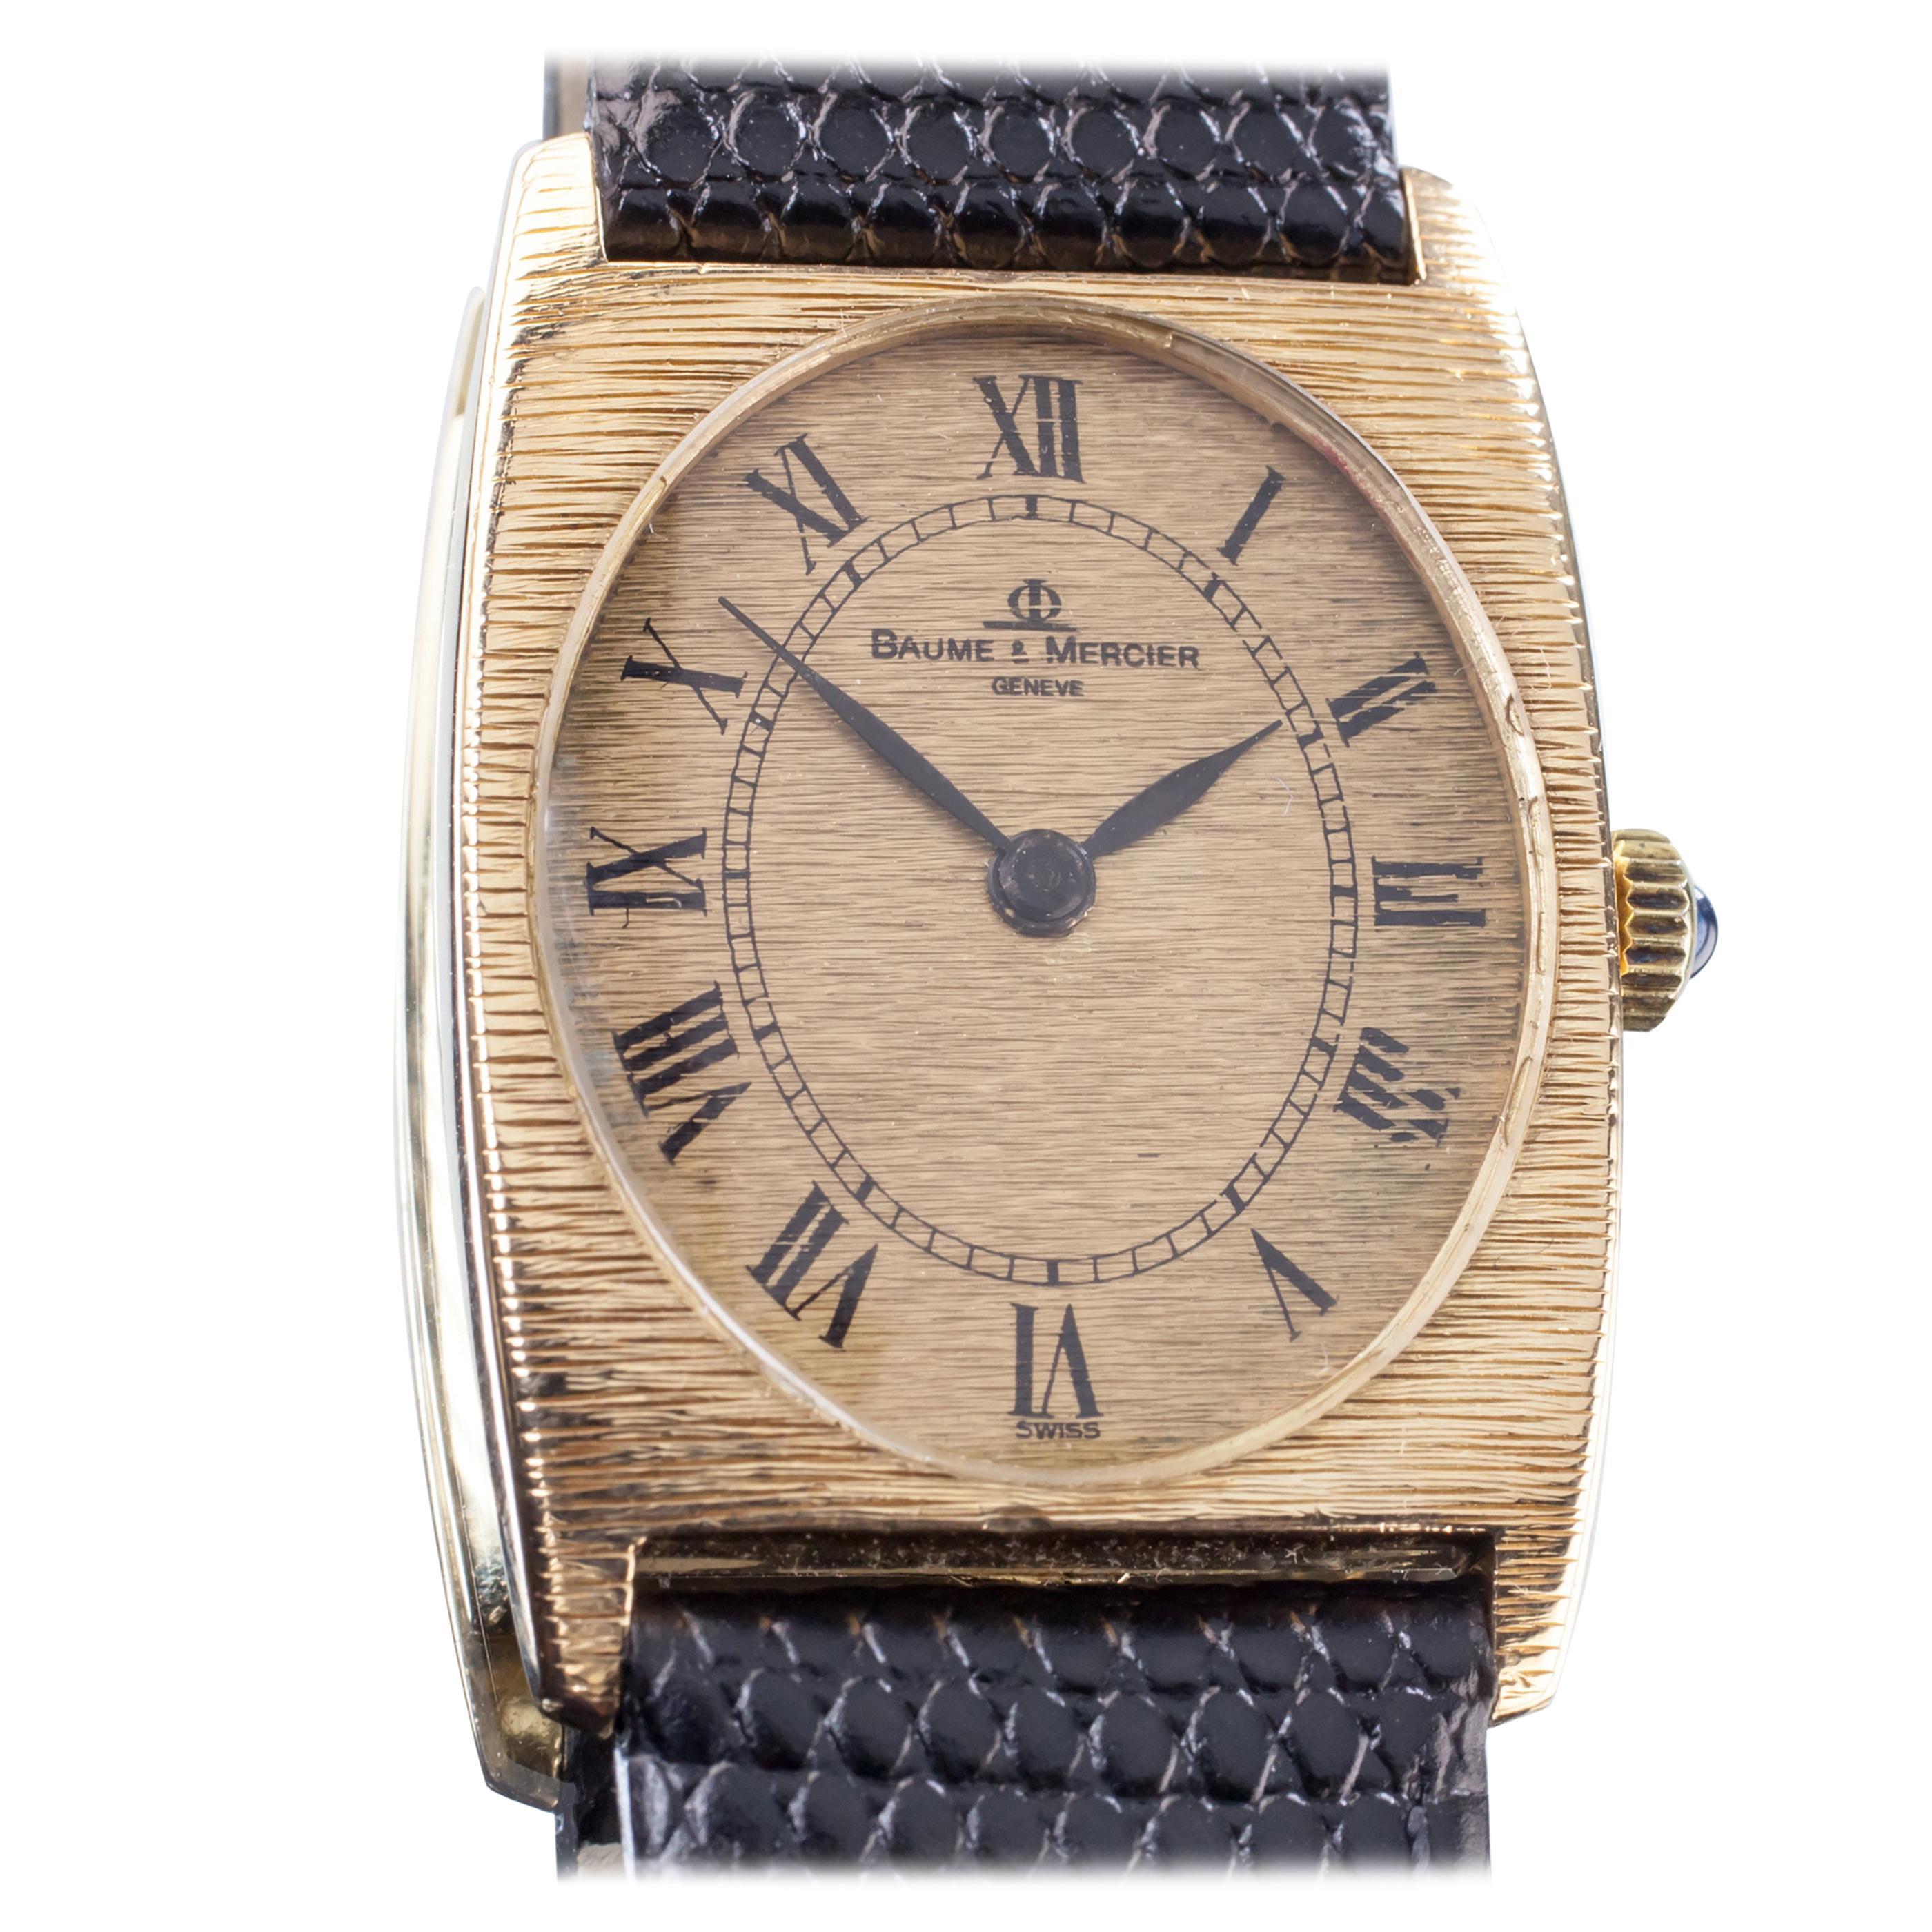 Baume & Mercier 18 Karat Gold Tonneau Hand-Winding Watch with Black Leather Band